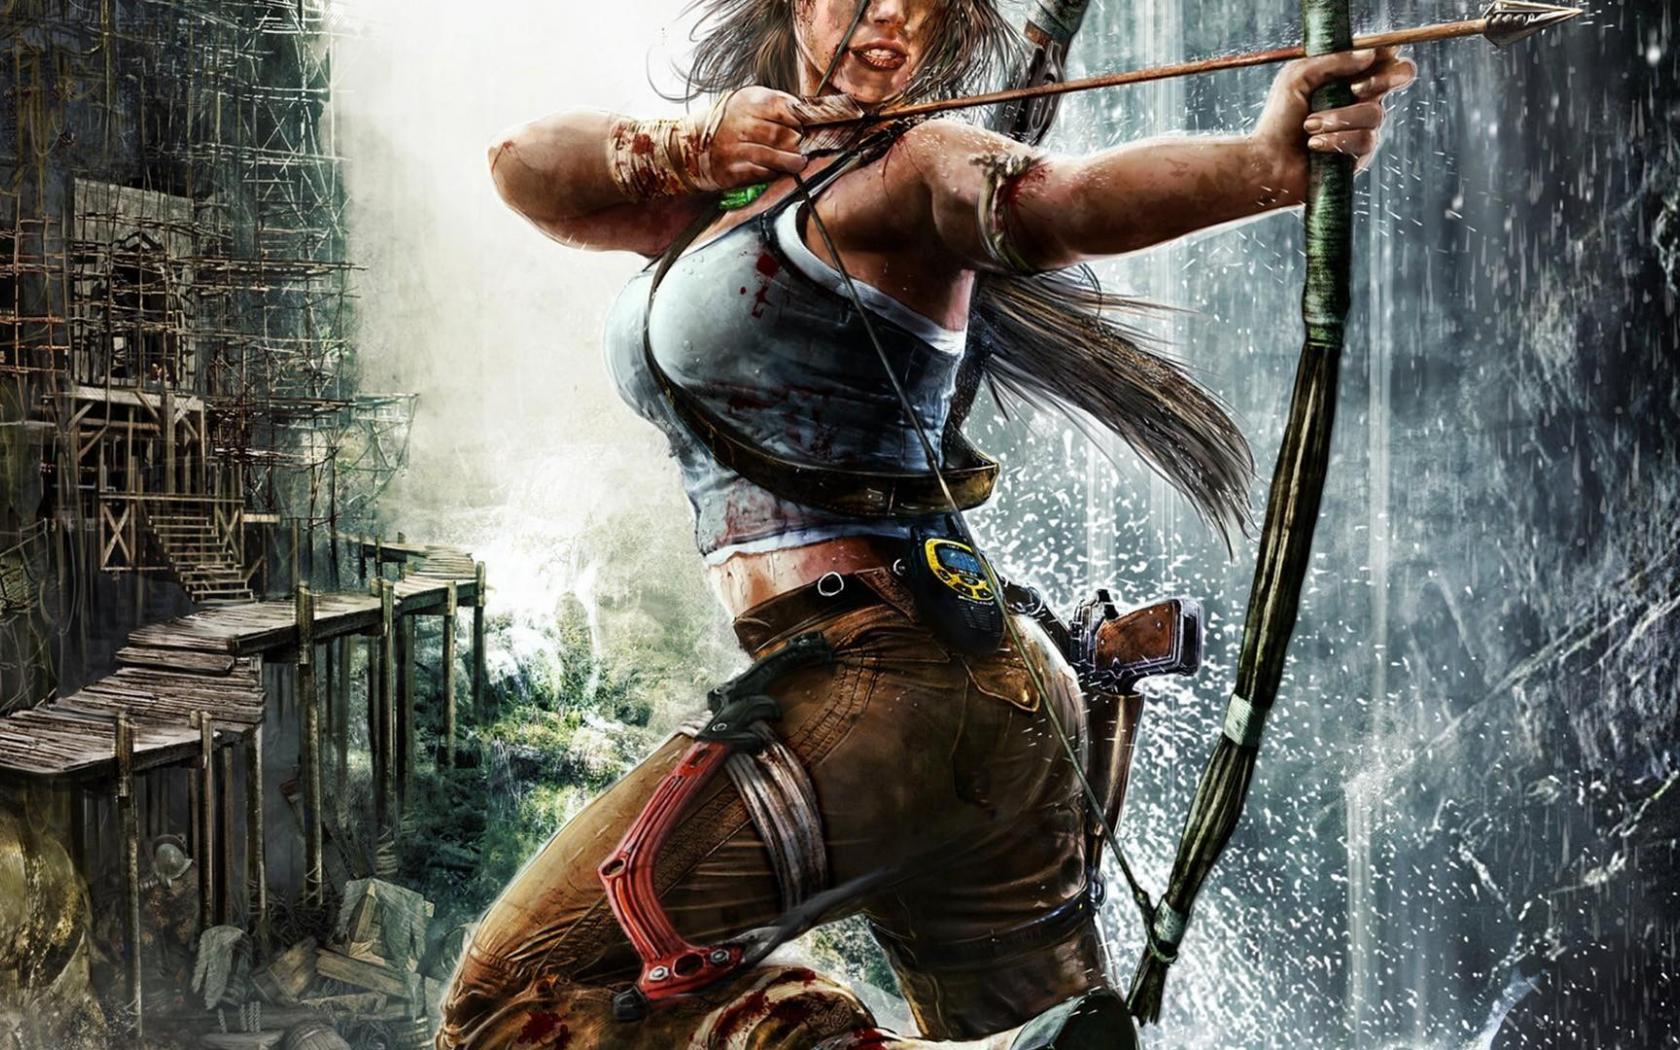 Free Download Tomb Raider Lara Croft 2013 Wallpaper 71644